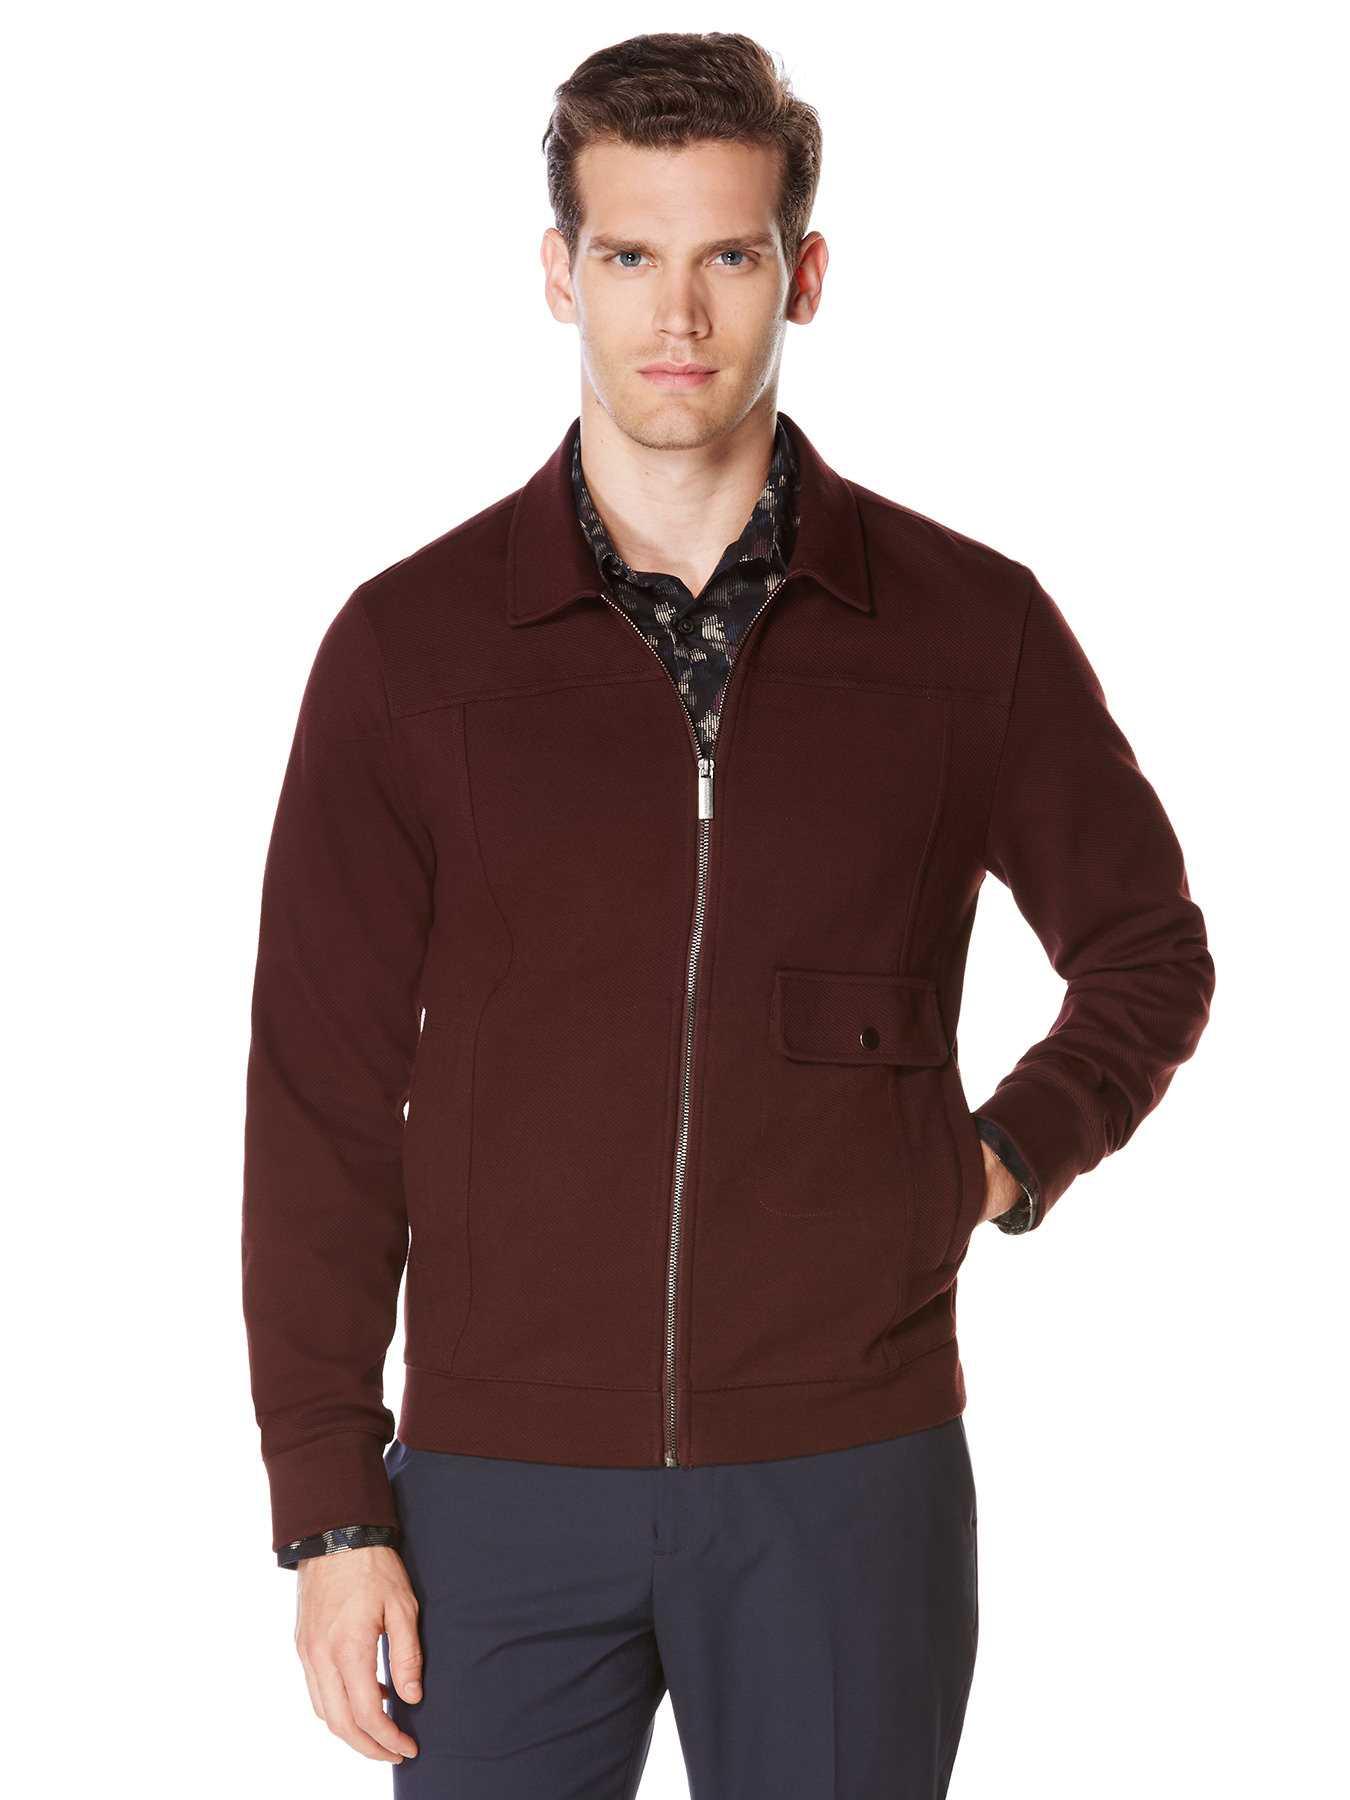 Perry Ellis Twill Knit Front Zip Jacket